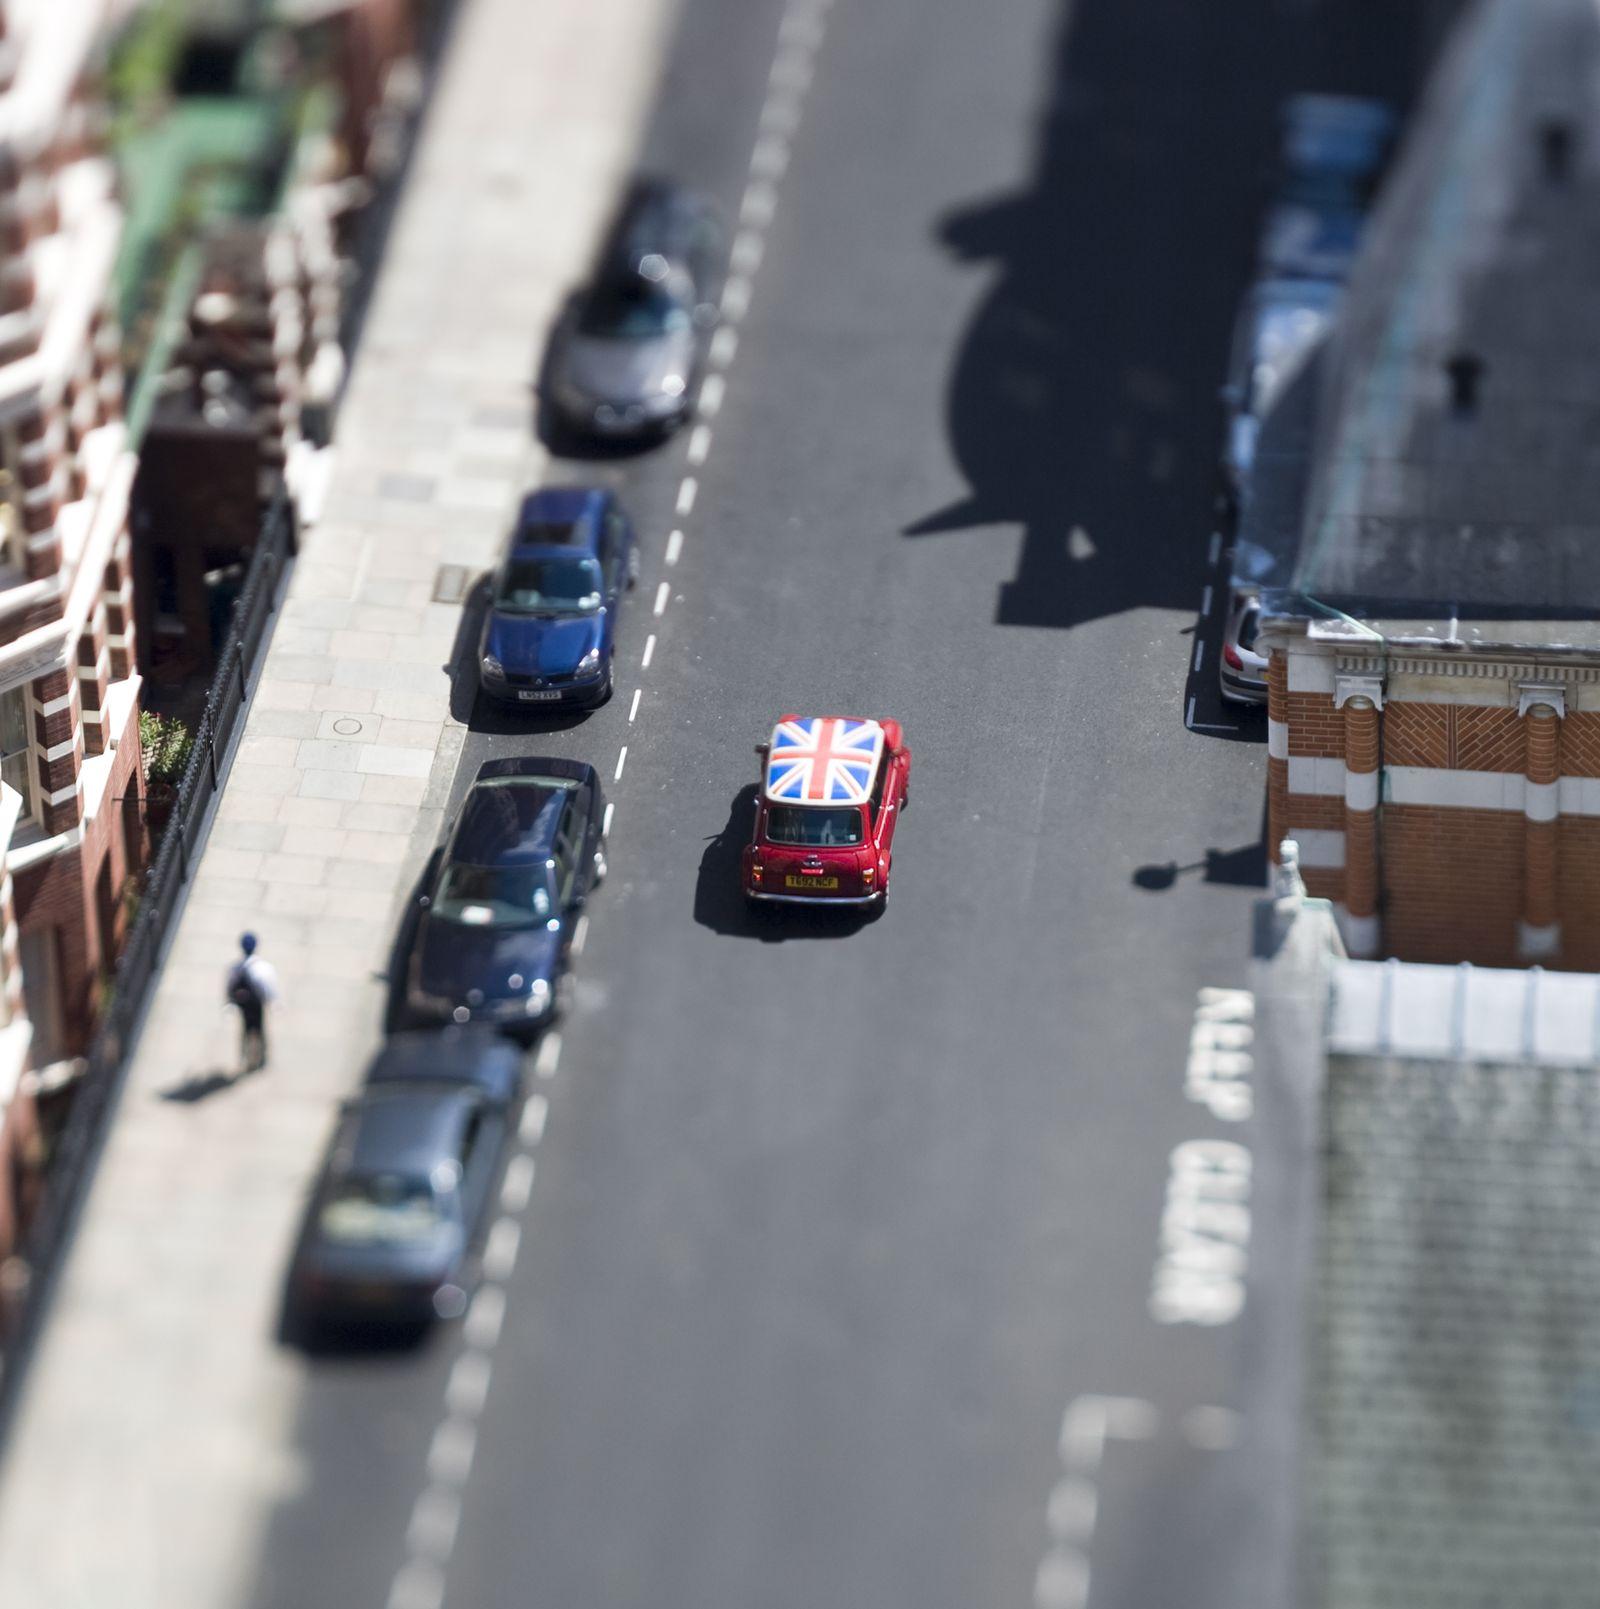 EINMALIGE VERWENDUNG Mini Cooper/ Westminster/ London